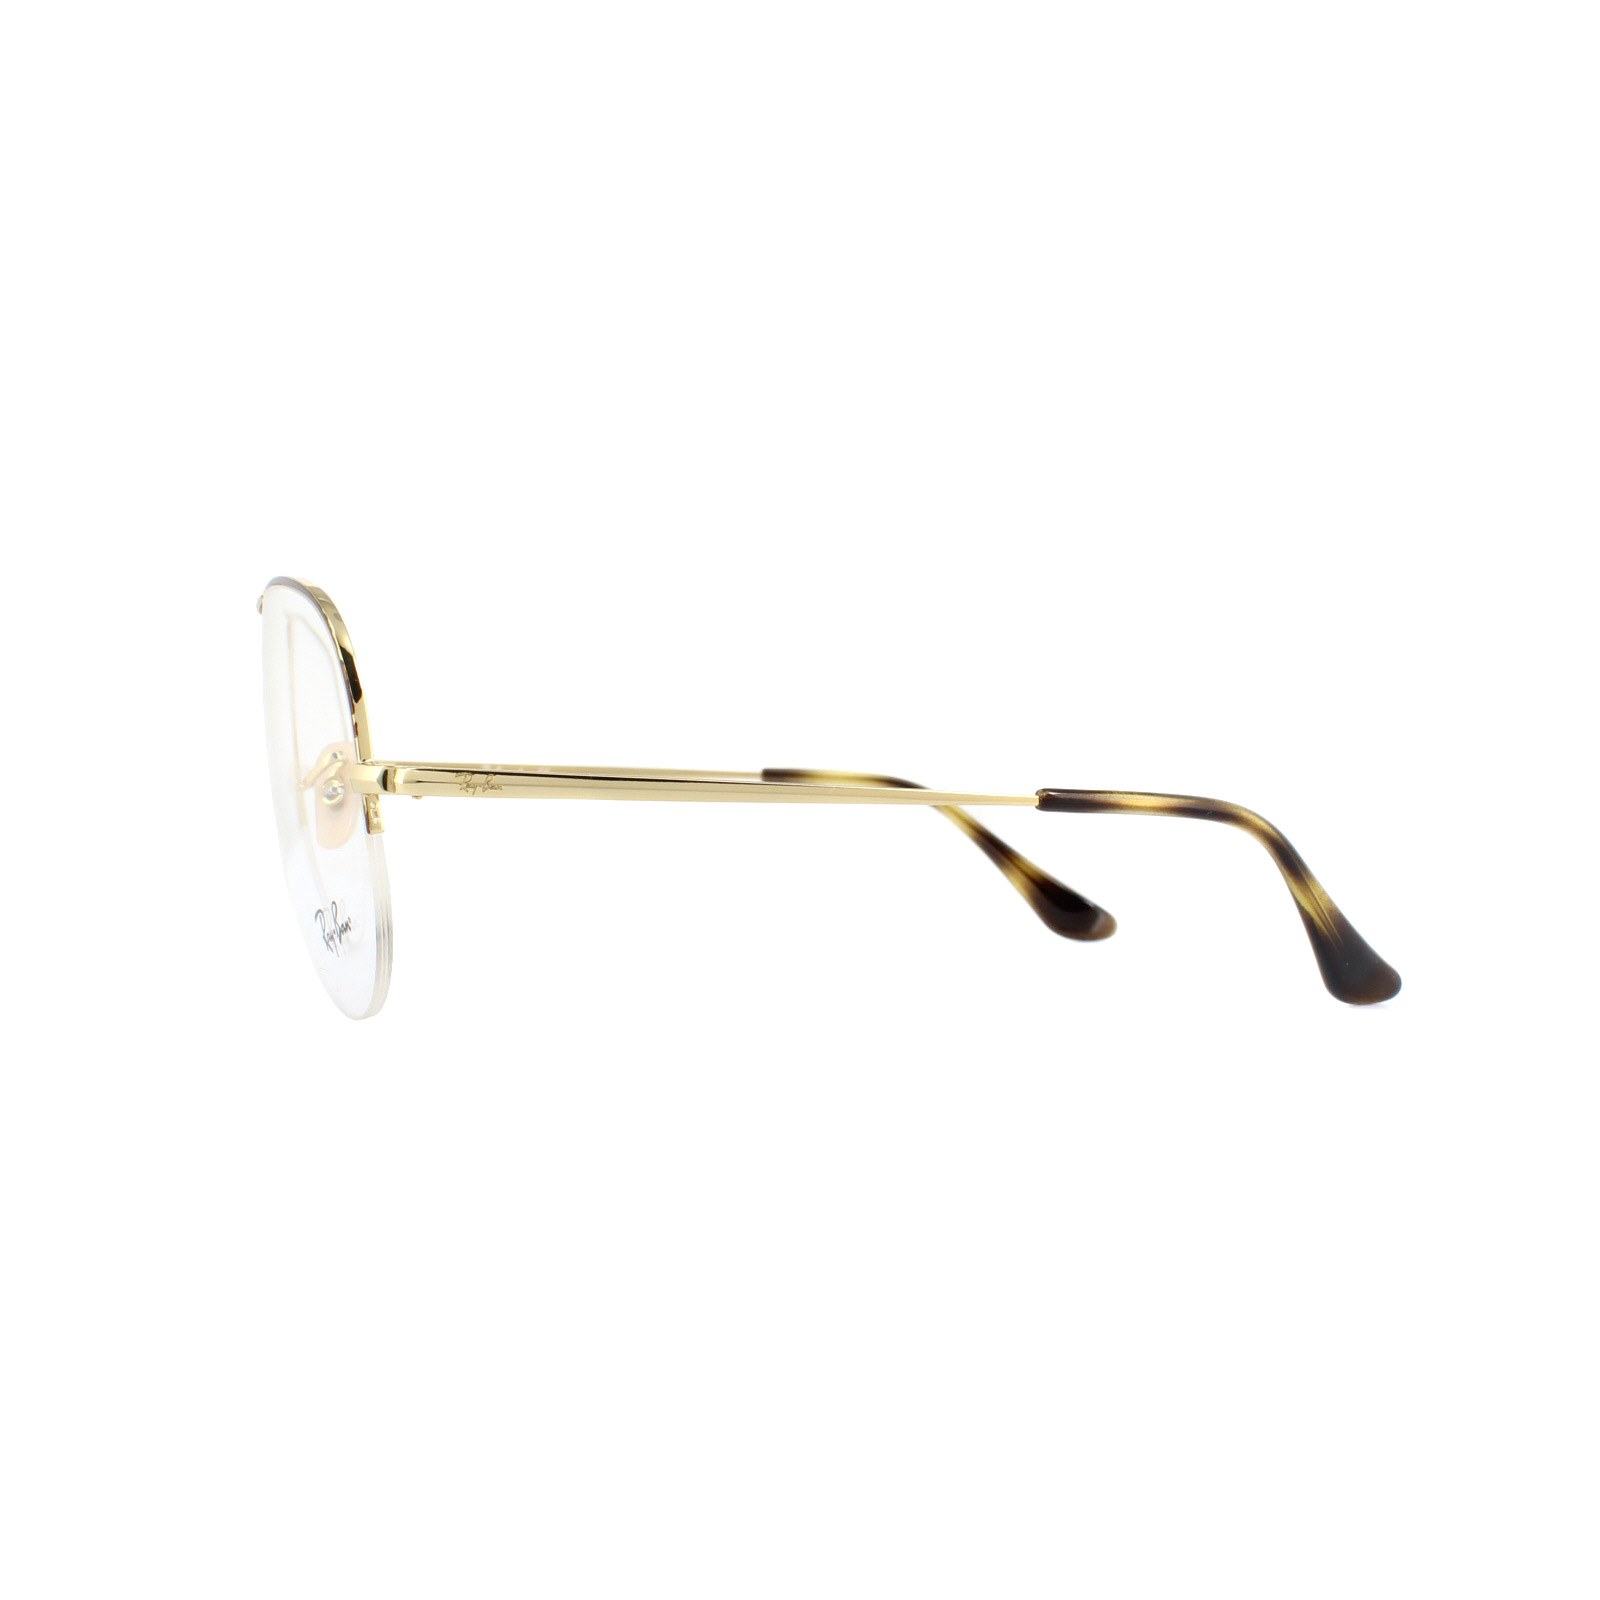 2daaf88875 Cheap Ray-Ban 6589 Glasses Frames - Discounted Sunglasses